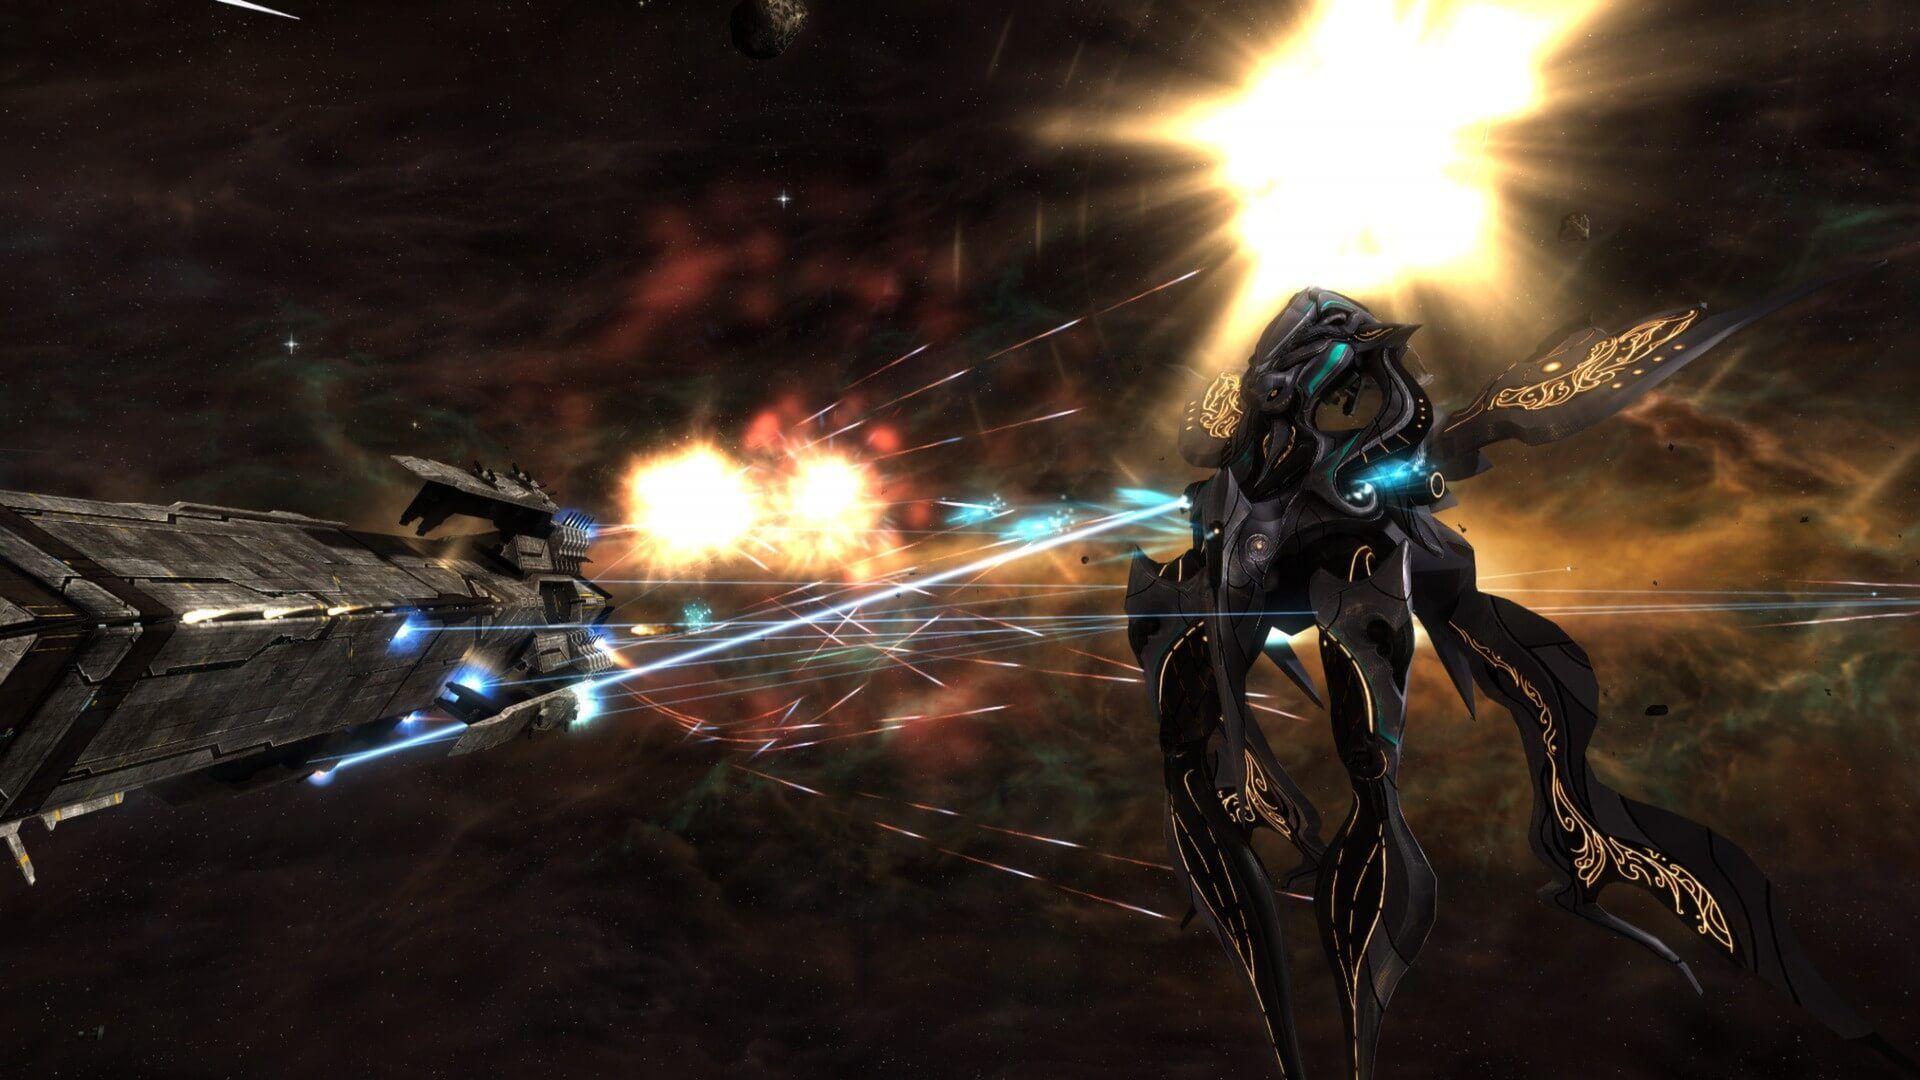 Sins of a Solar Empire: Rebellion jogo está gratuito por tempo limitado